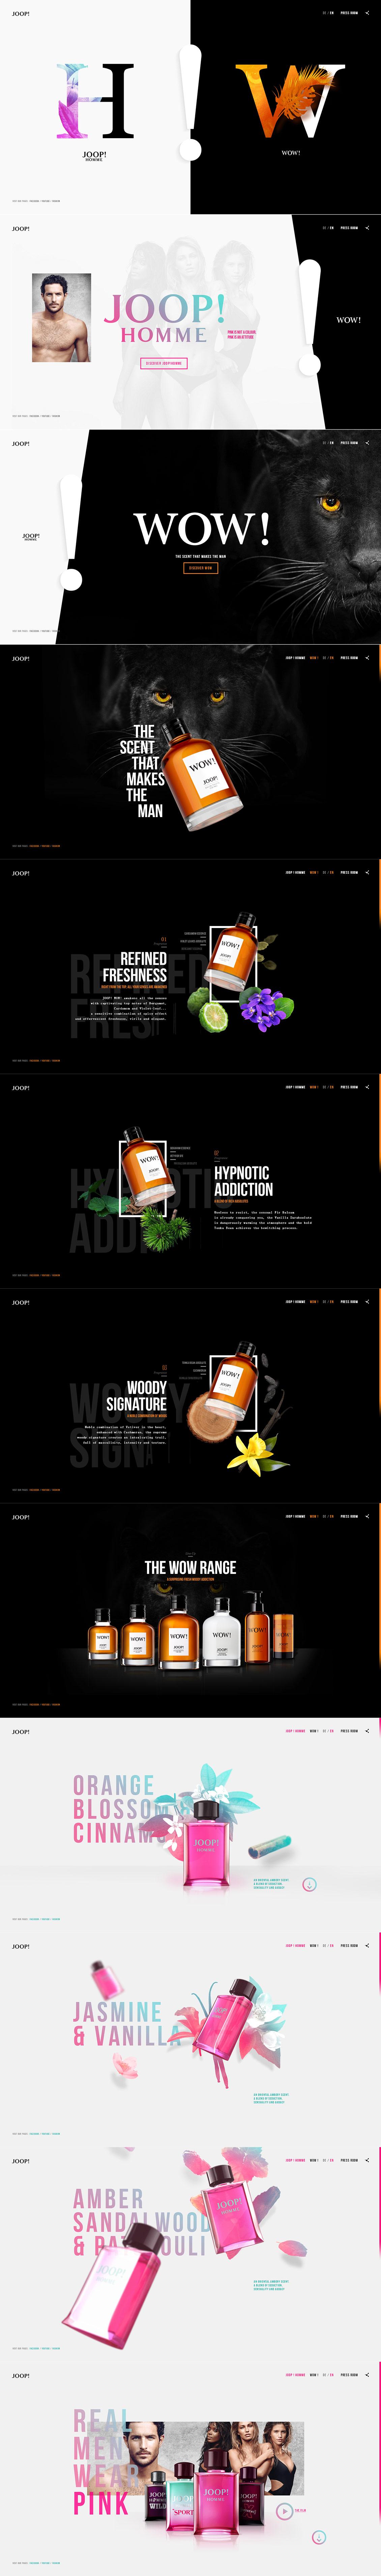 国外Joop fragrances香水产品网站设计欣赏